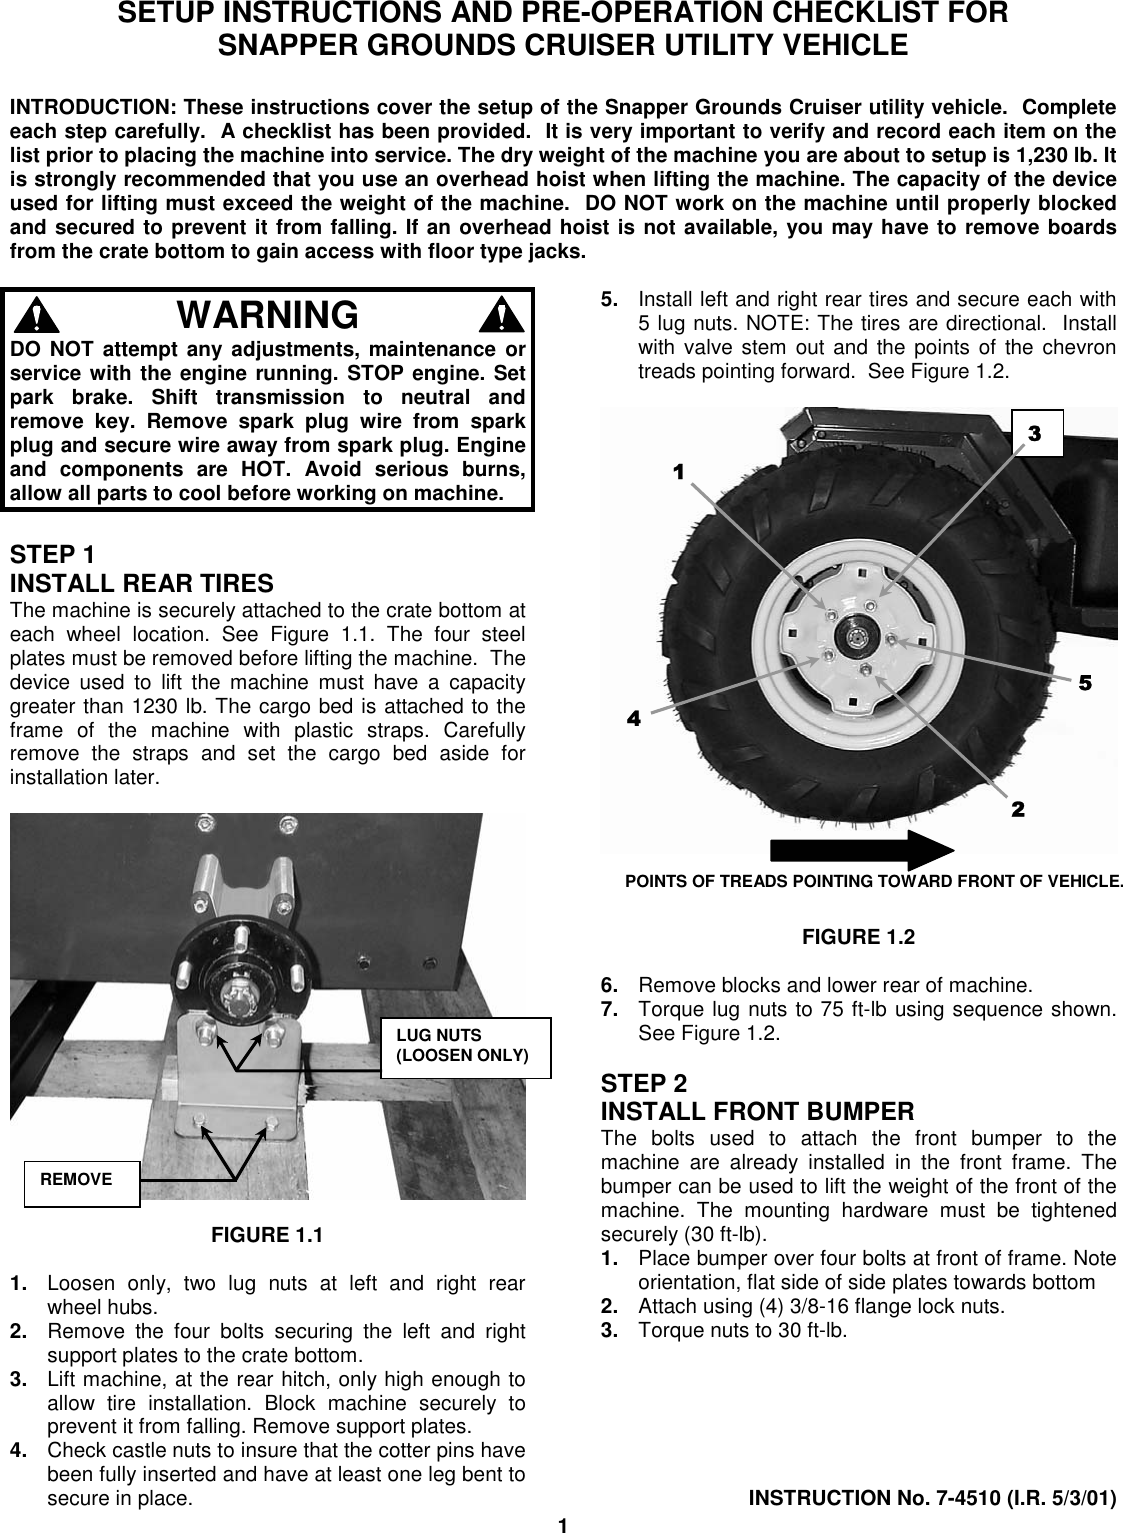 Curt 58291 Vehicle Manual Guide